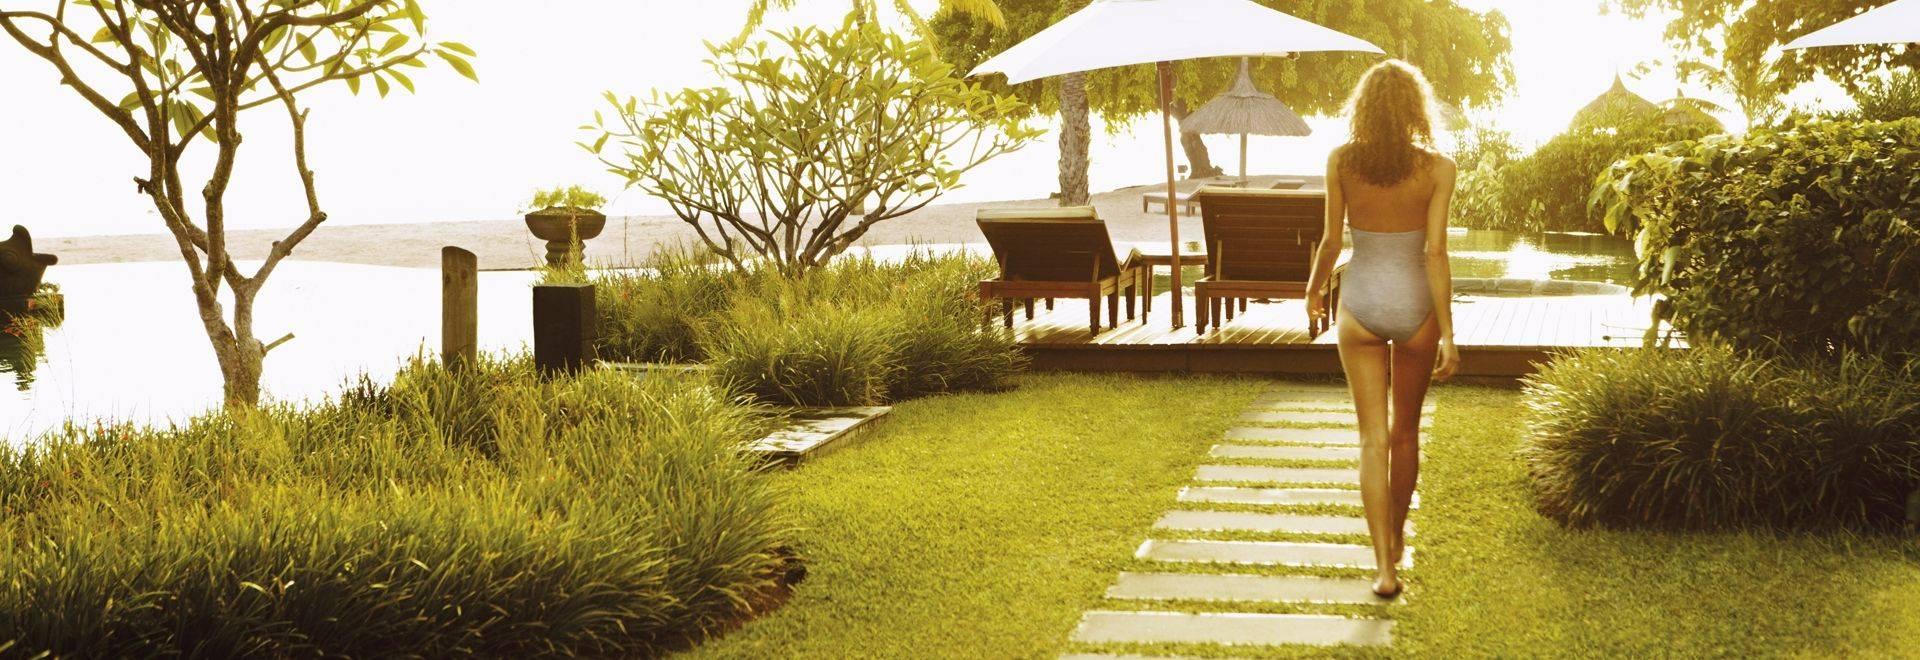 Shanti-Maurice-woman-gardens.jpg